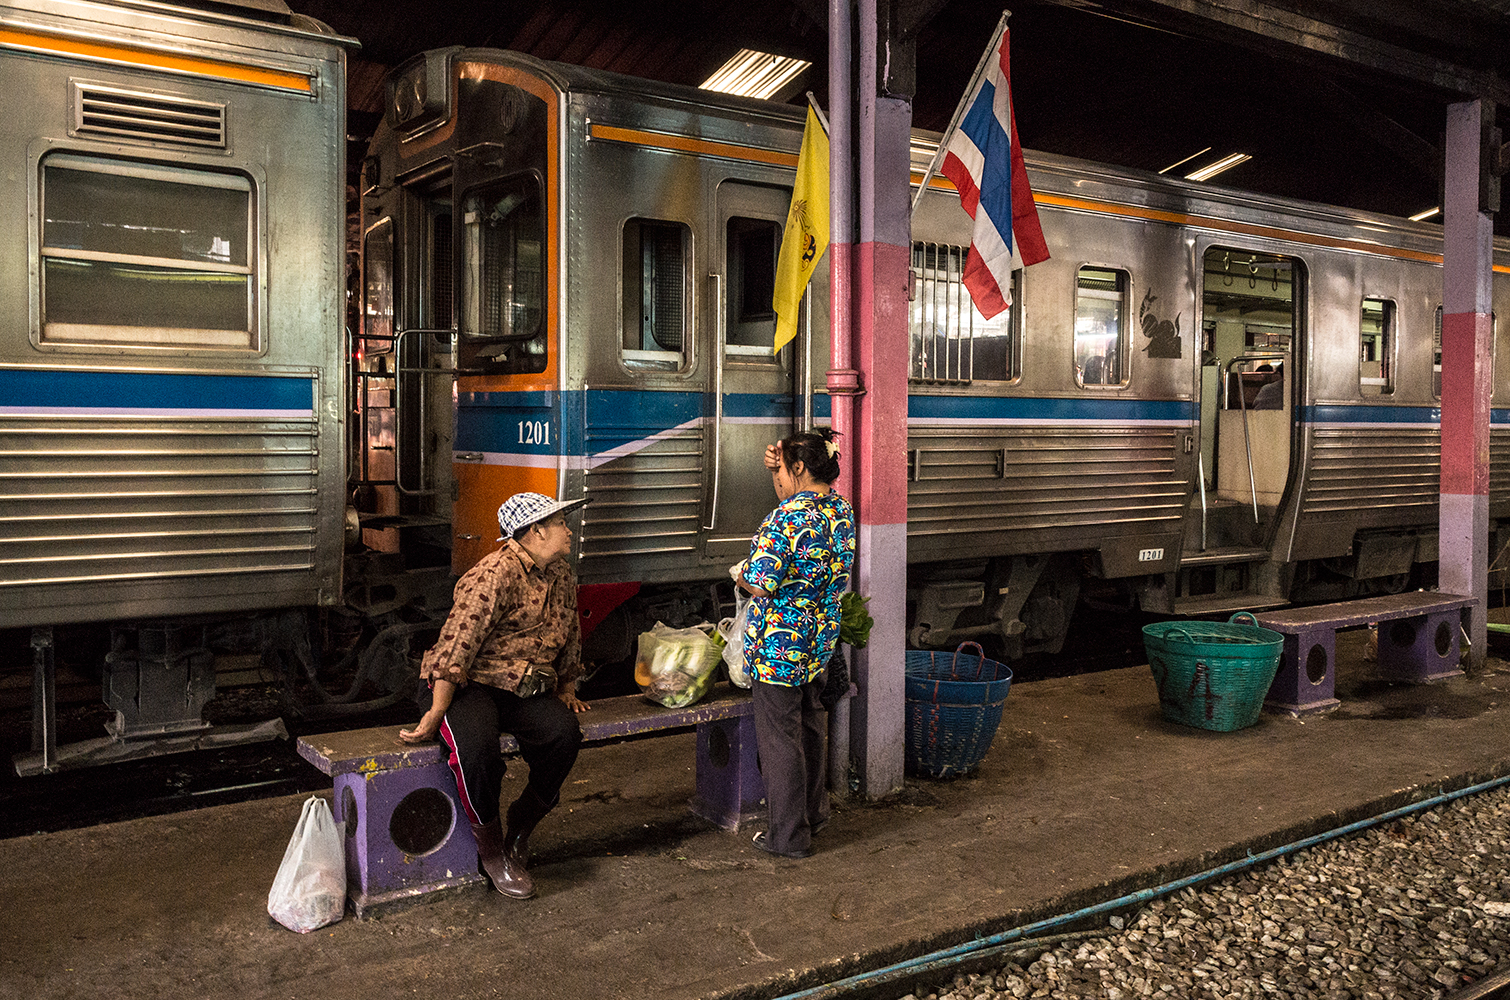 train-story2_s.jpg